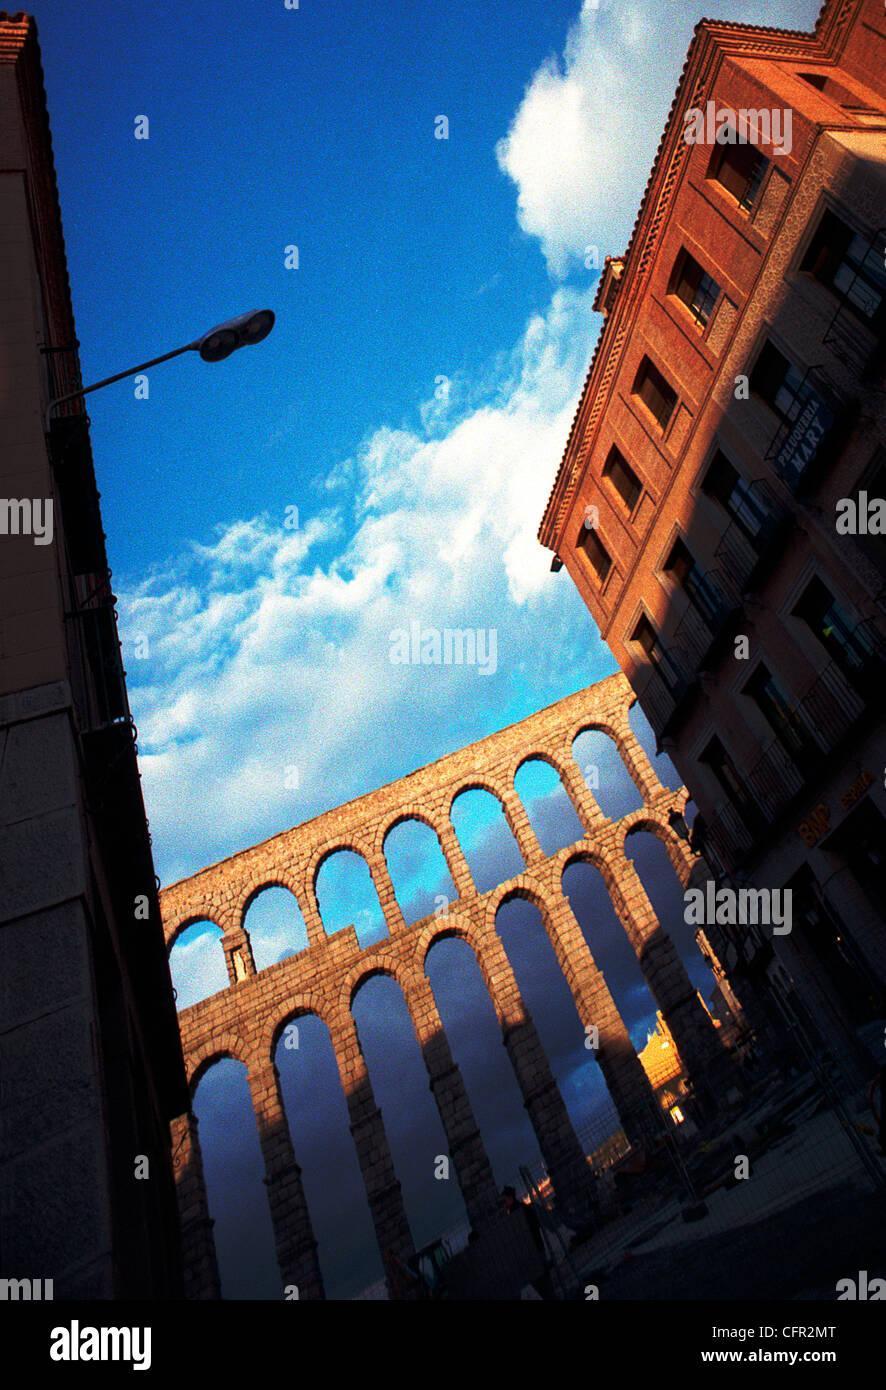 Acueducto de Segovia. Stock Photo